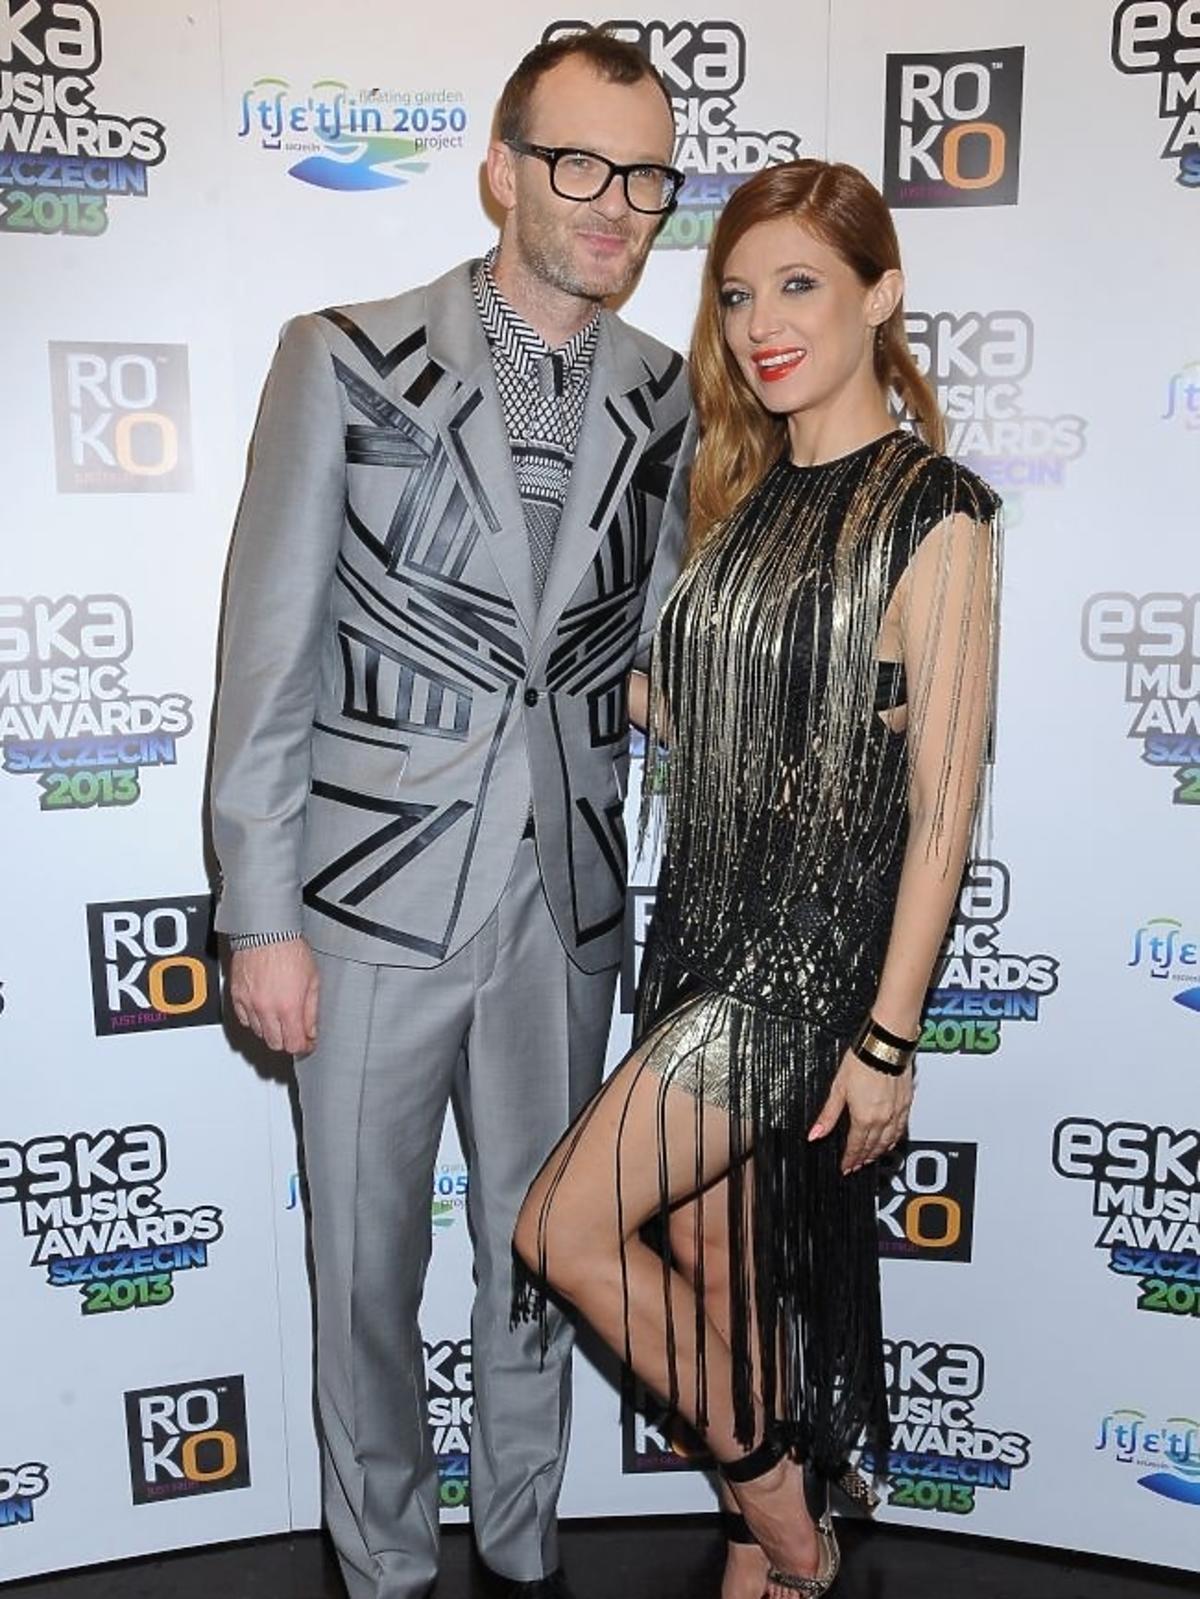 Jankes i Ada Fijał na gali Eska Music Awards 2013